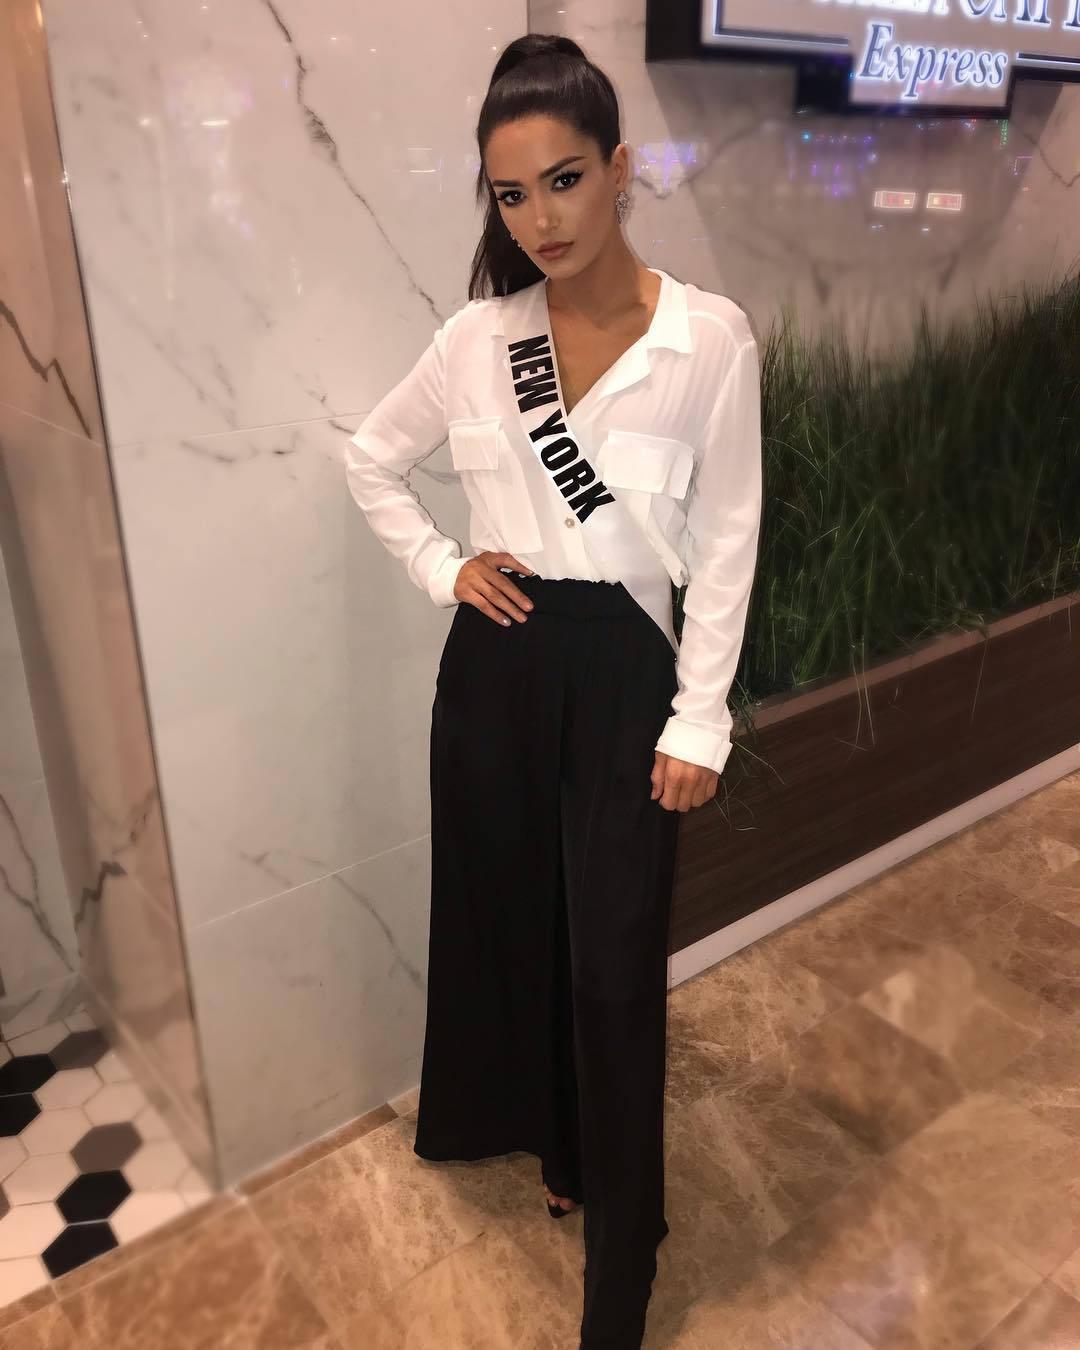 florinda kajtazi, miss new york 2019. - Página 4 57487927_393570928155335_4632893635179962499_n